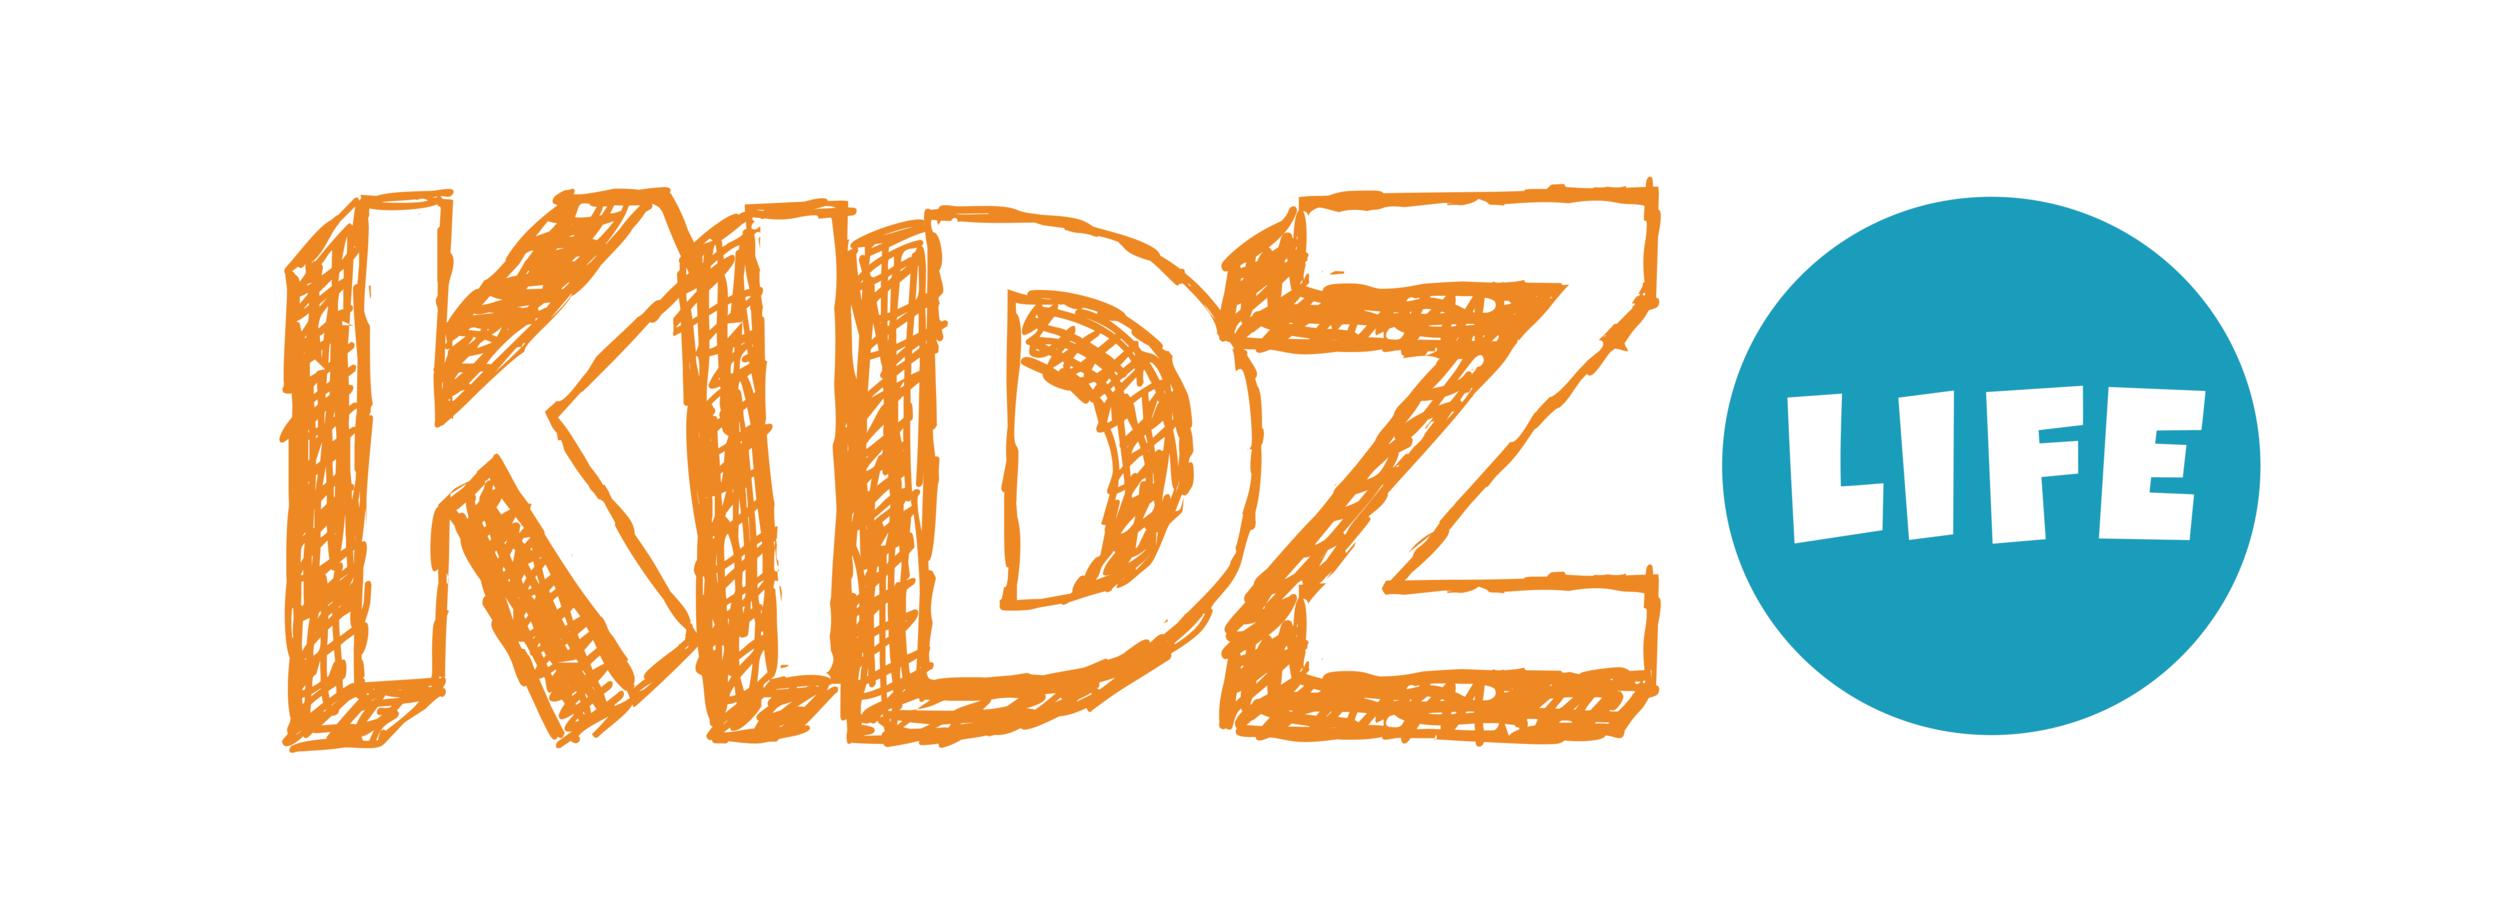 KidzLife_Banner.png